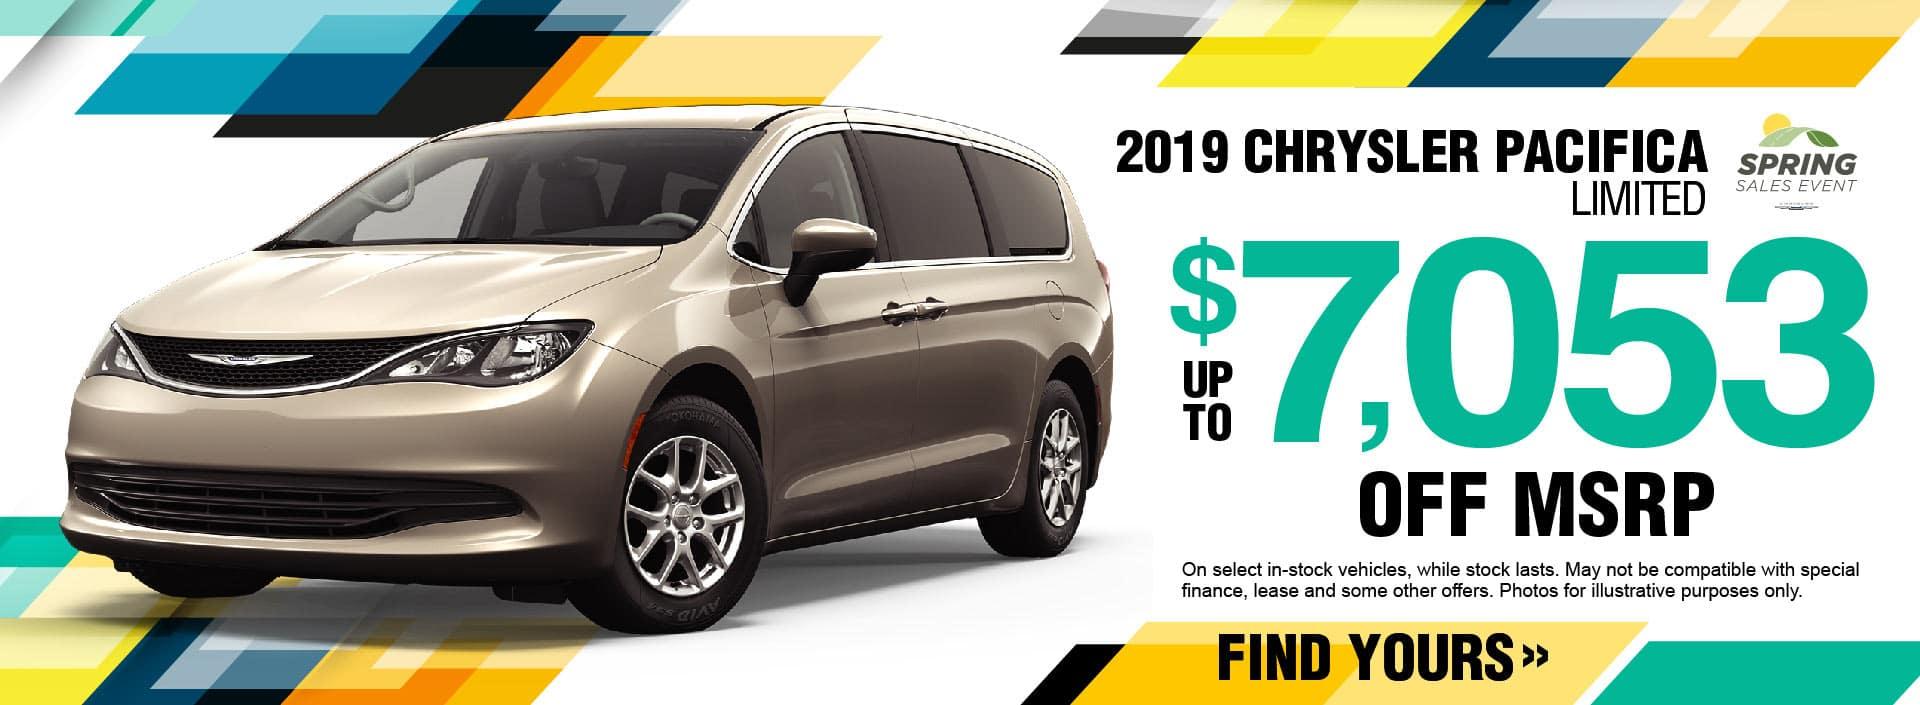 2019 Chrysler Pacifica Savings